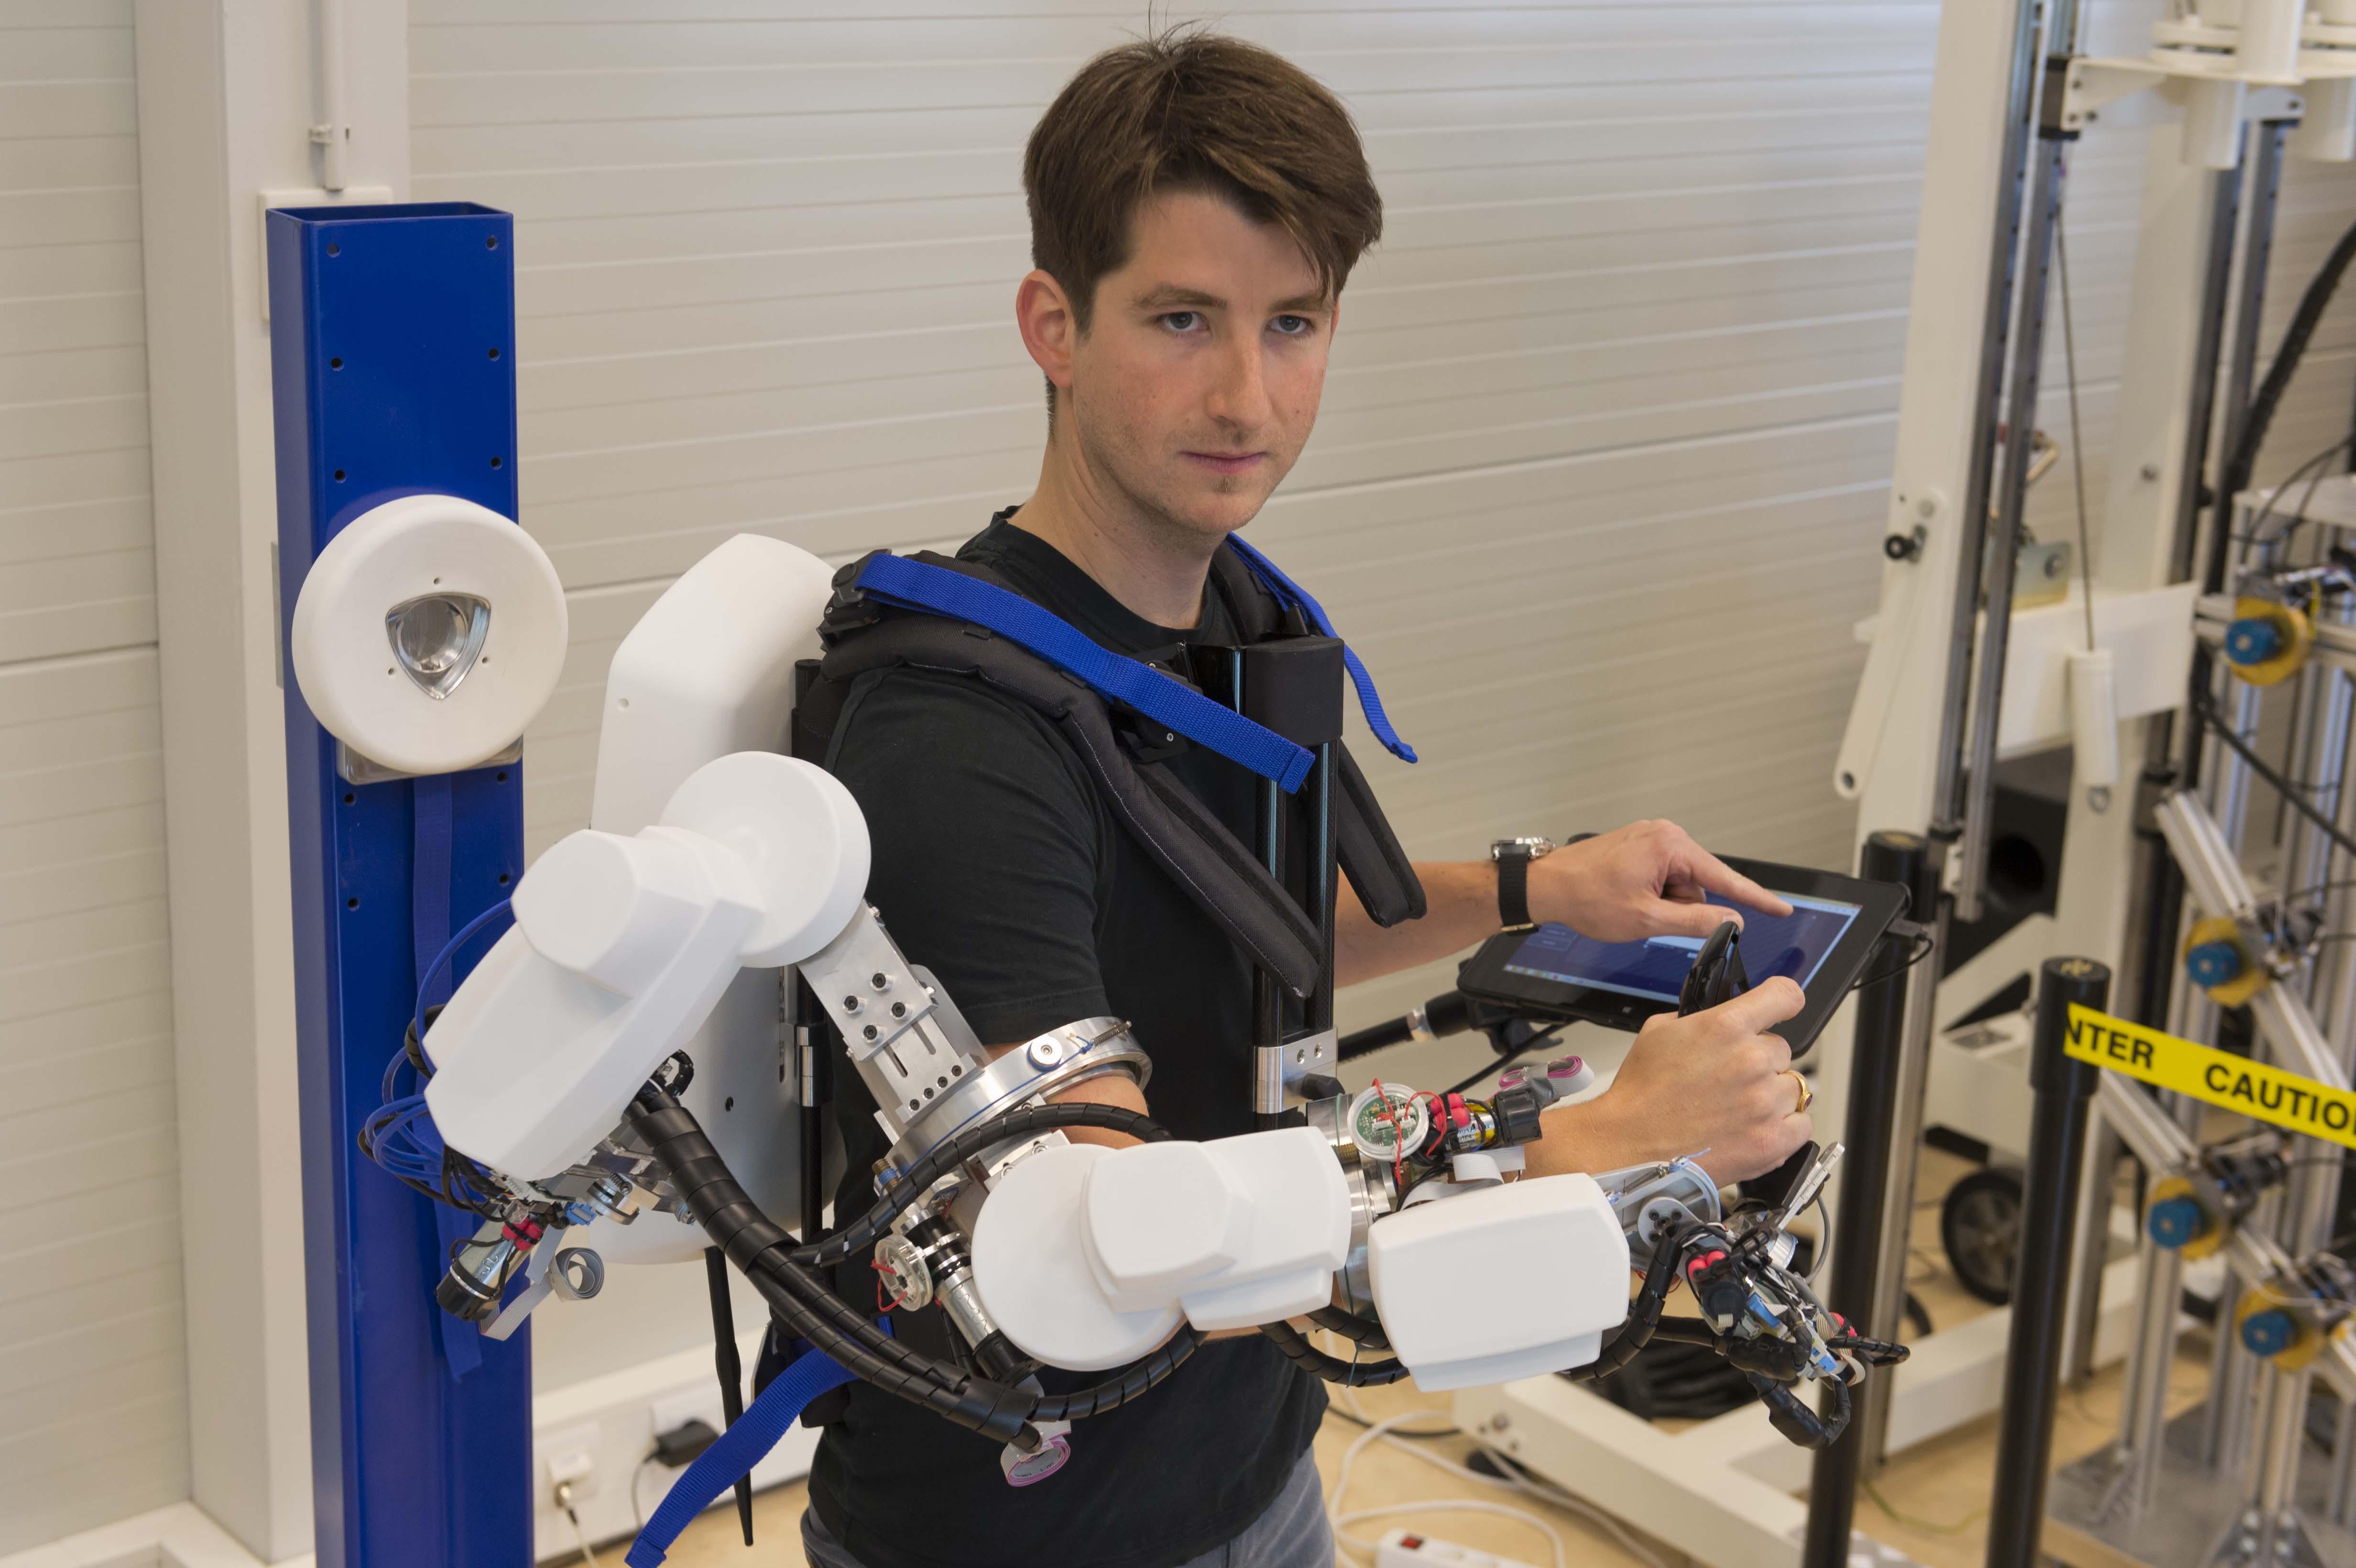 Space in Images - 2014 - 05 - Telerobotics exoskeleton